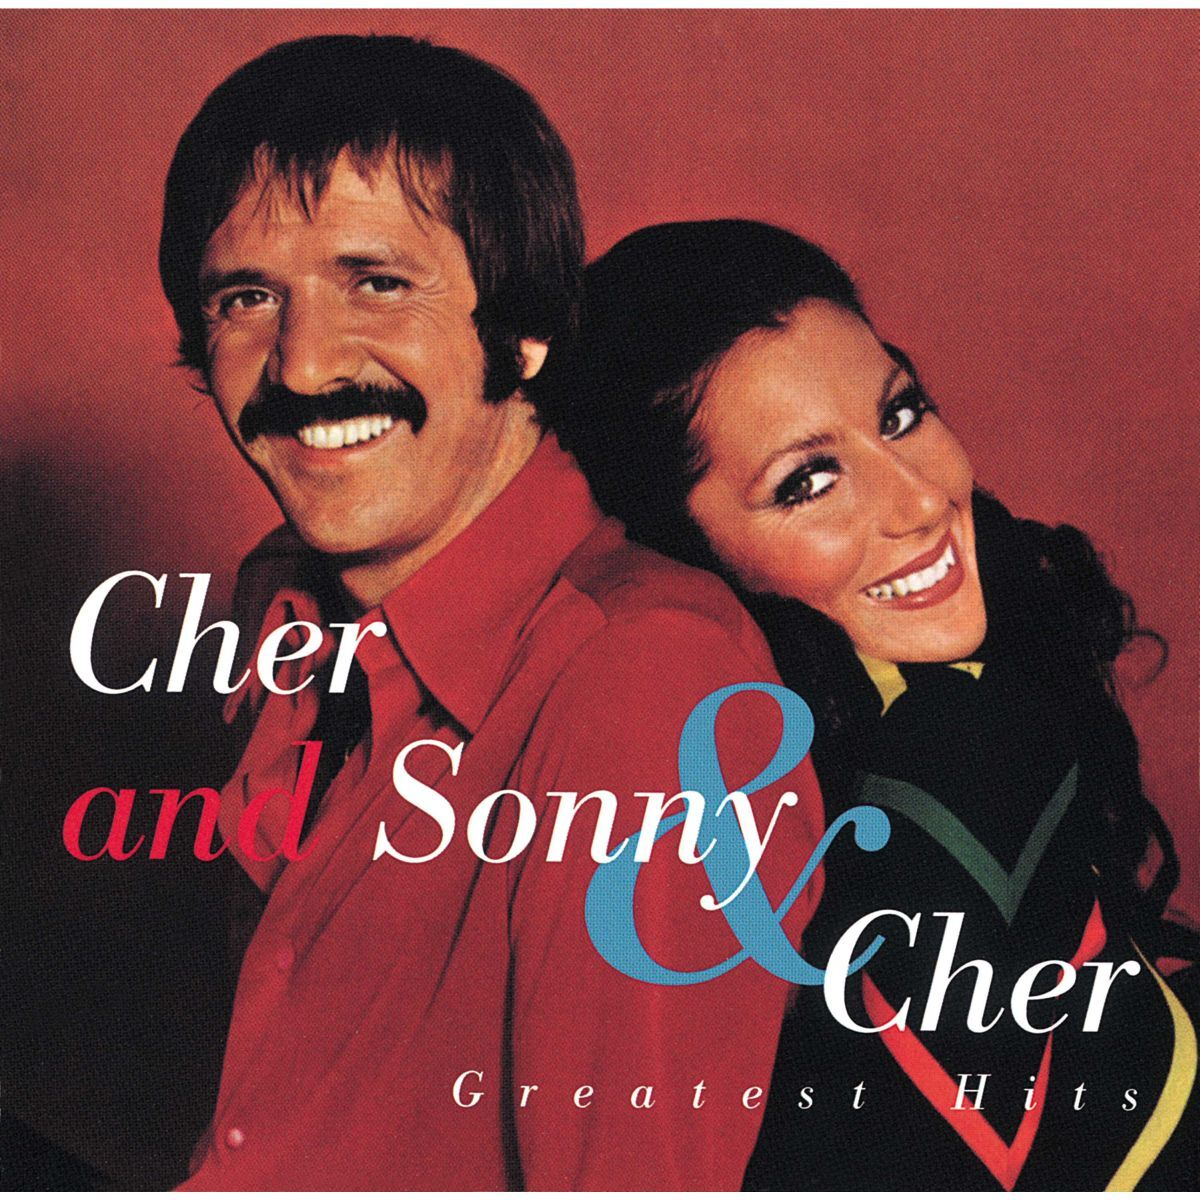 Sonny & Cher Greatest Hits